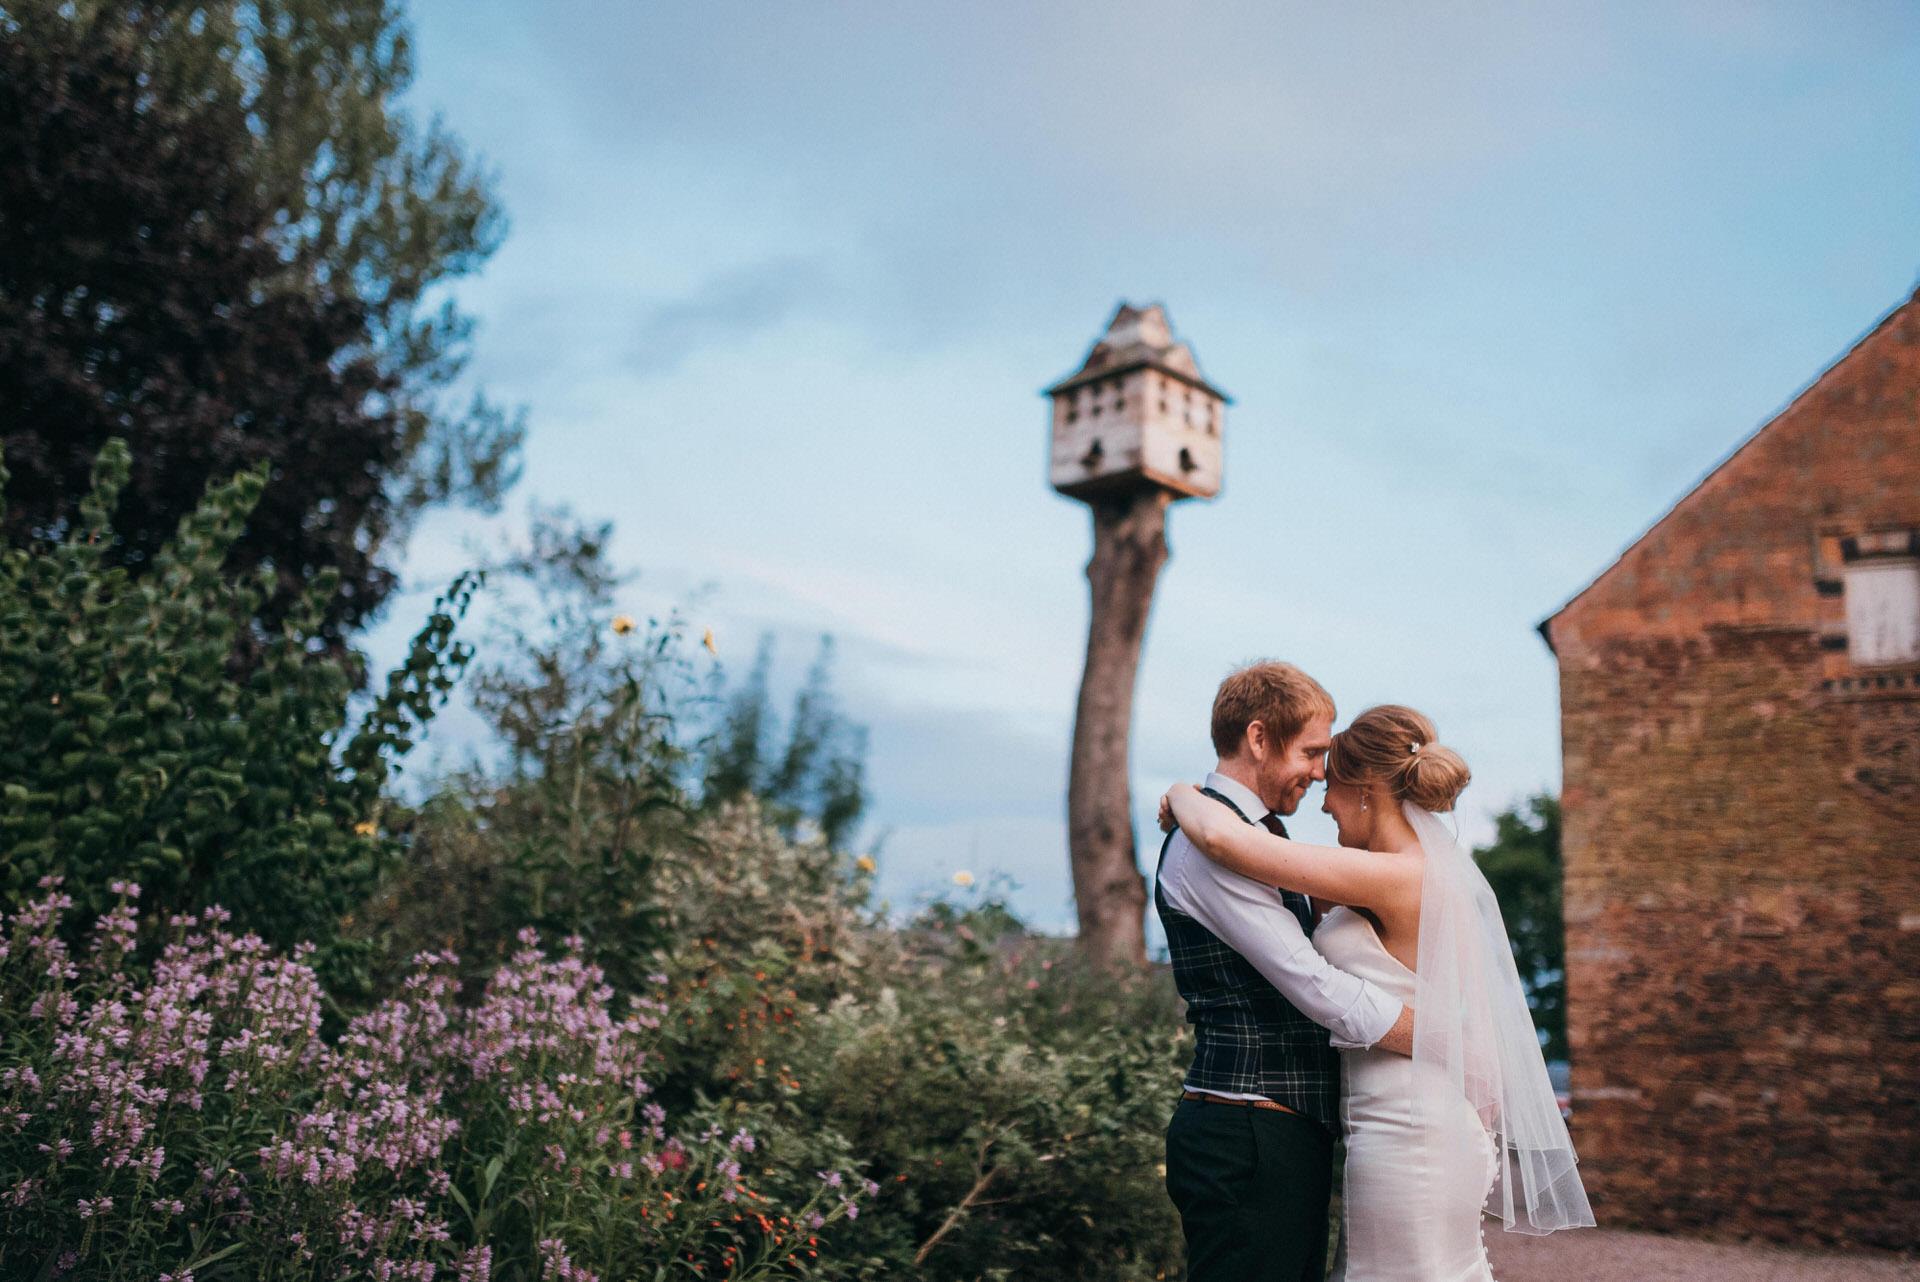 Maunsel house wedding photography 58 wedding portrait